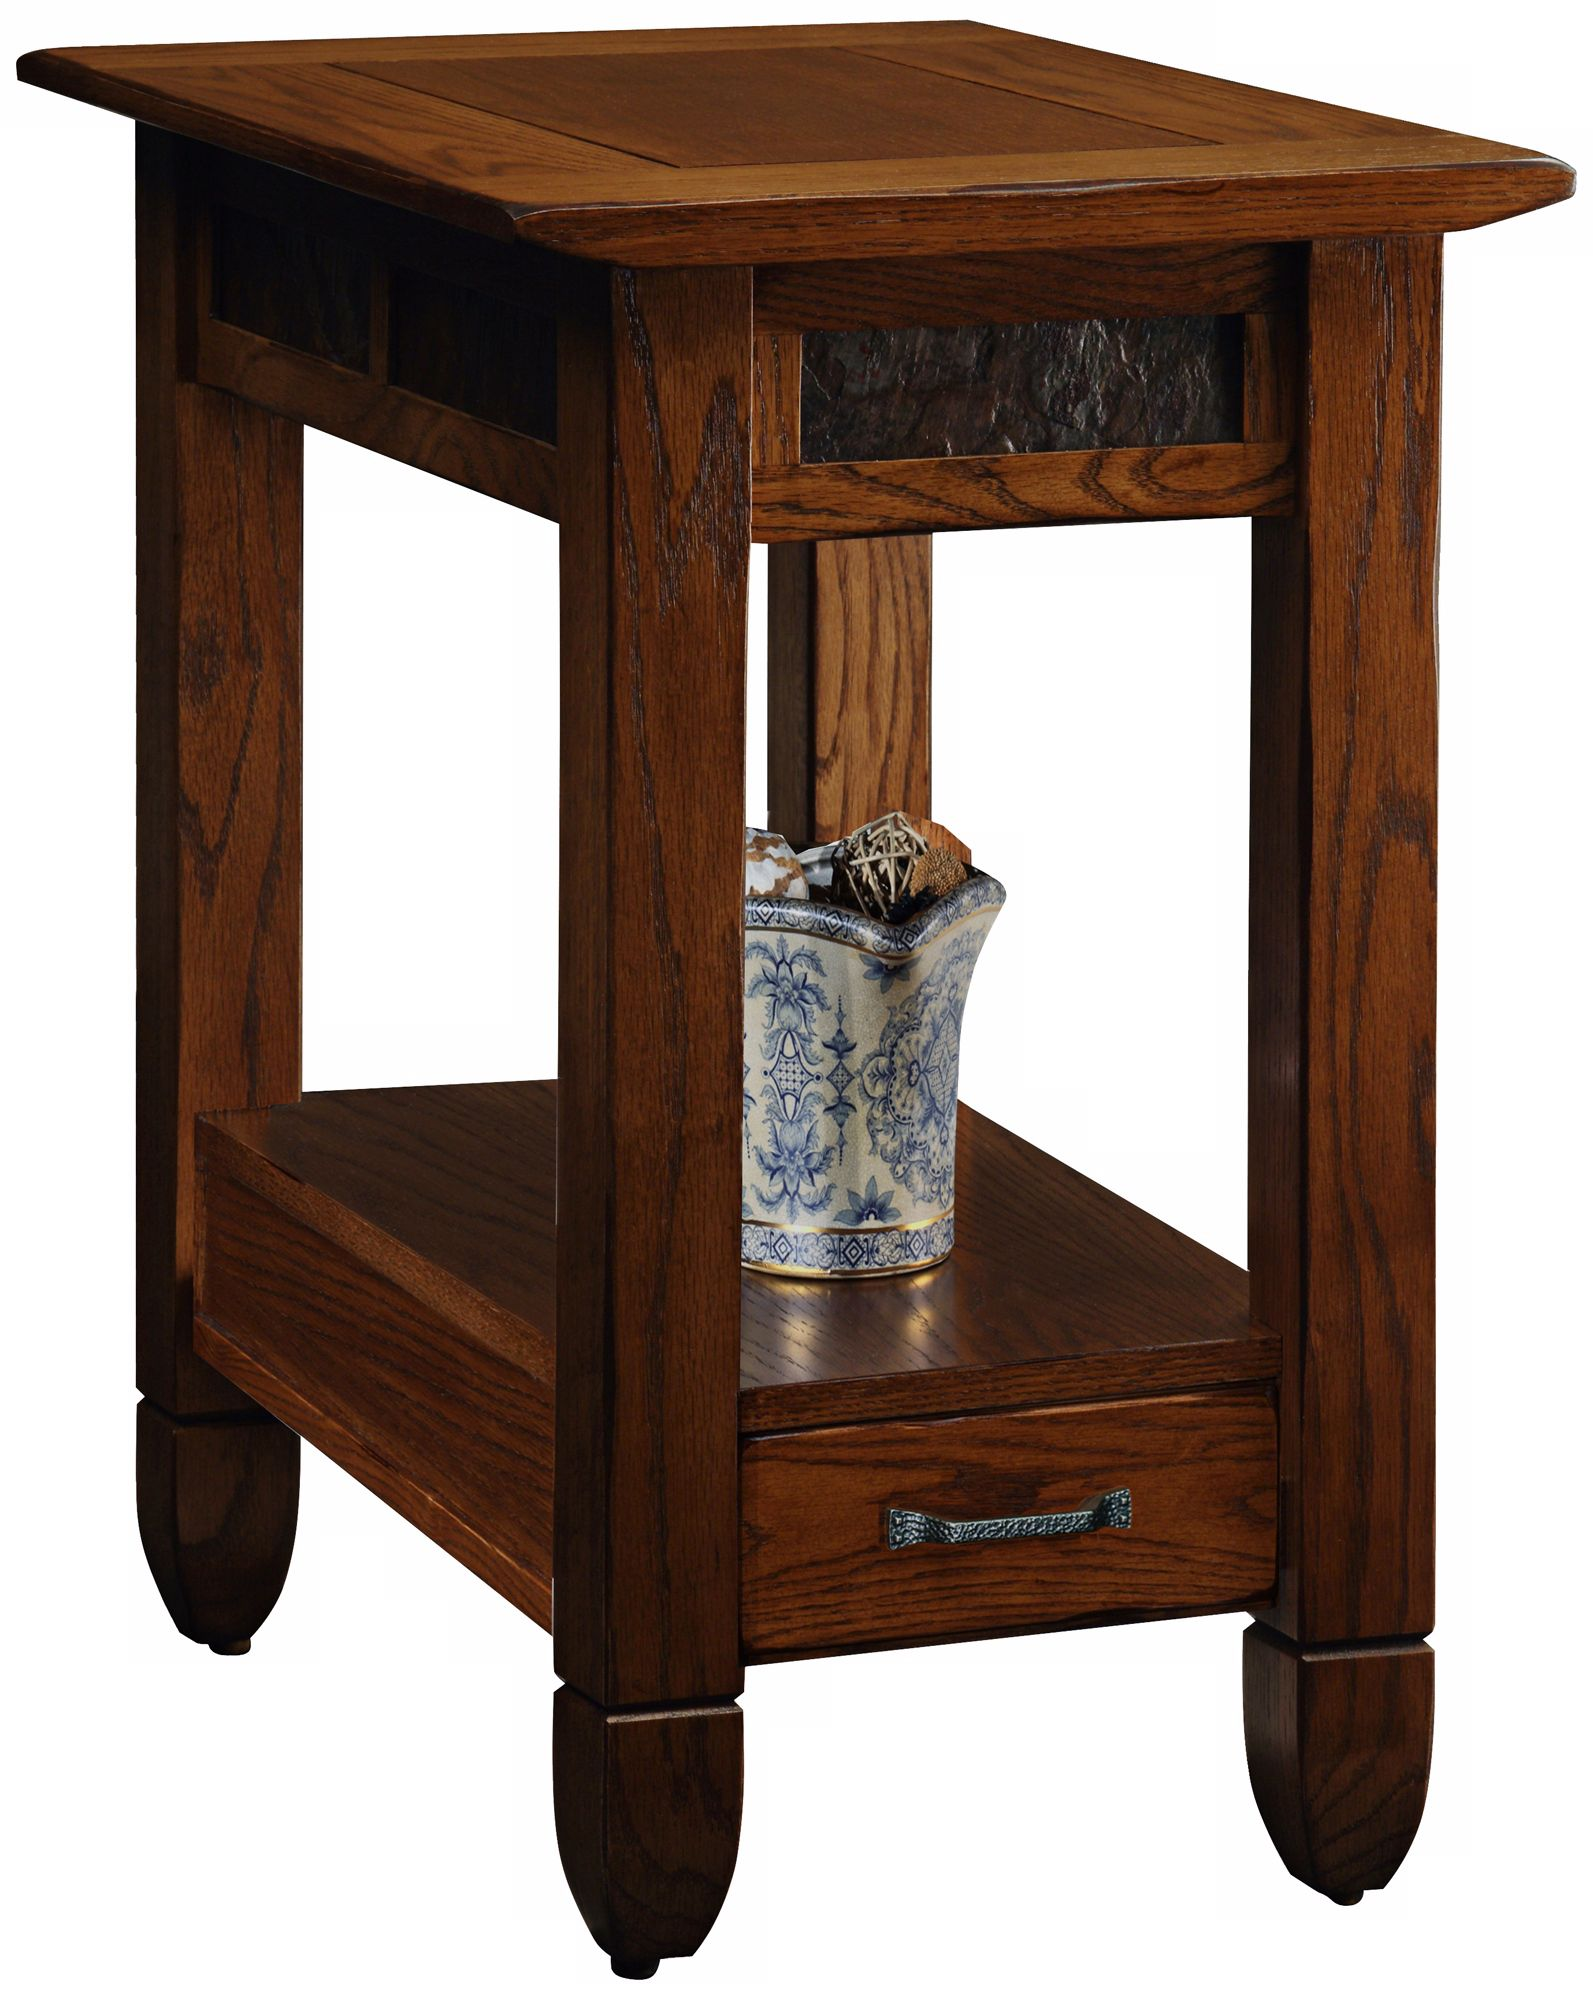 Leick Furniture Slatestone Rustic Oak End Table